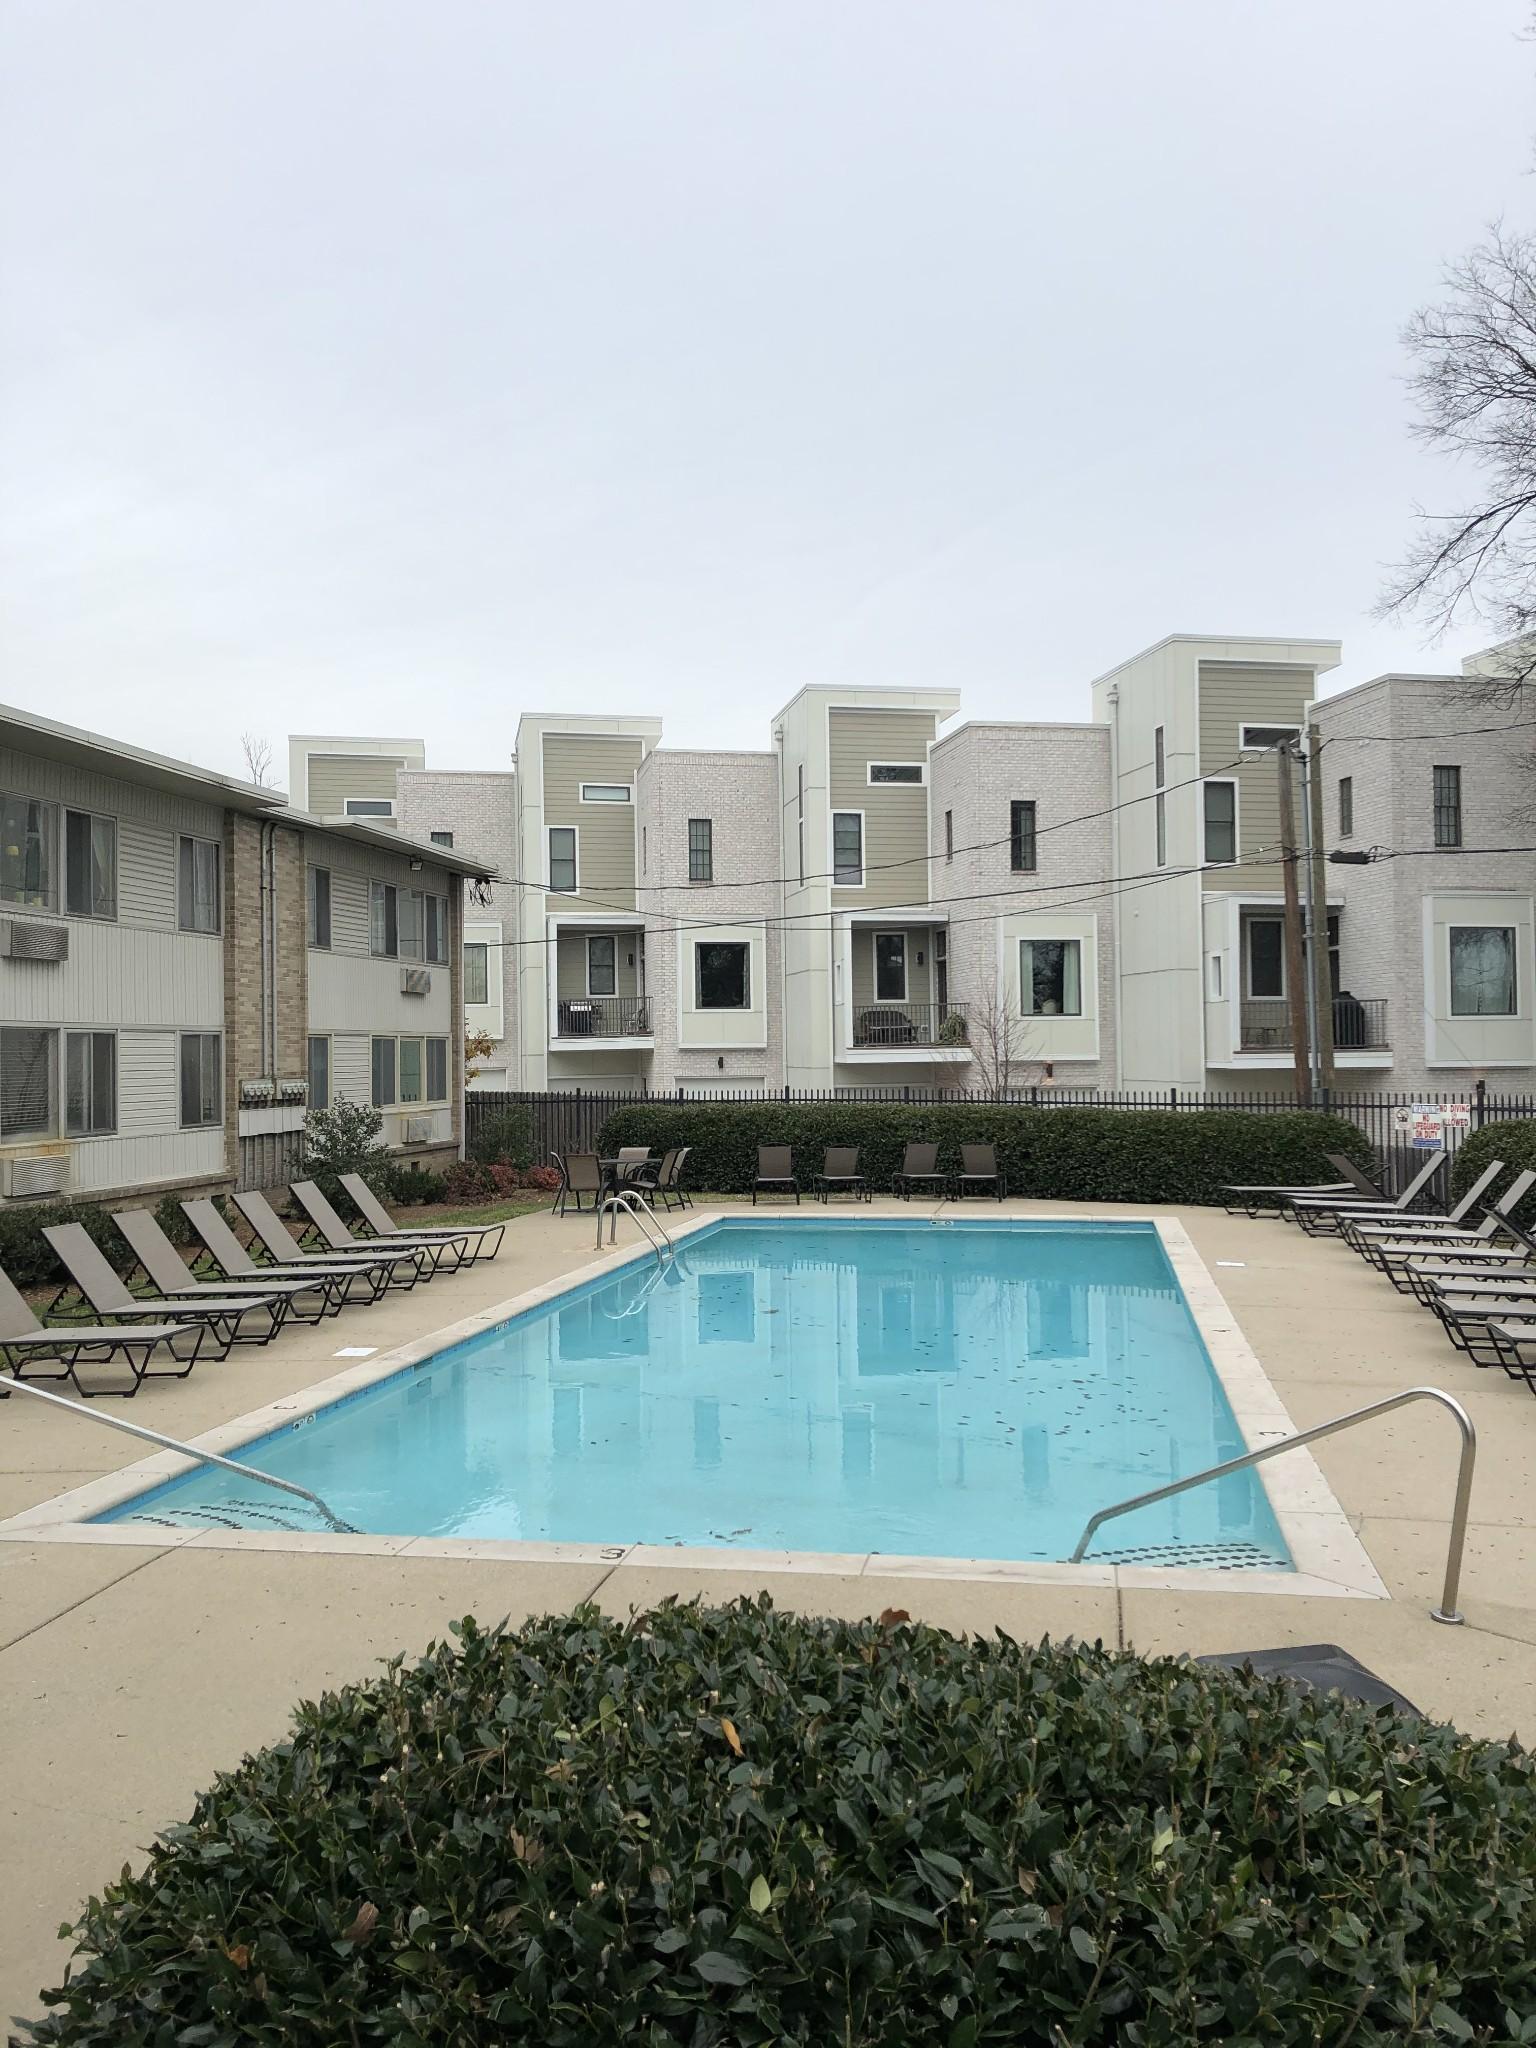 2020 Beech Ave #B5 Property Photo - Nashville, TN real estate listing